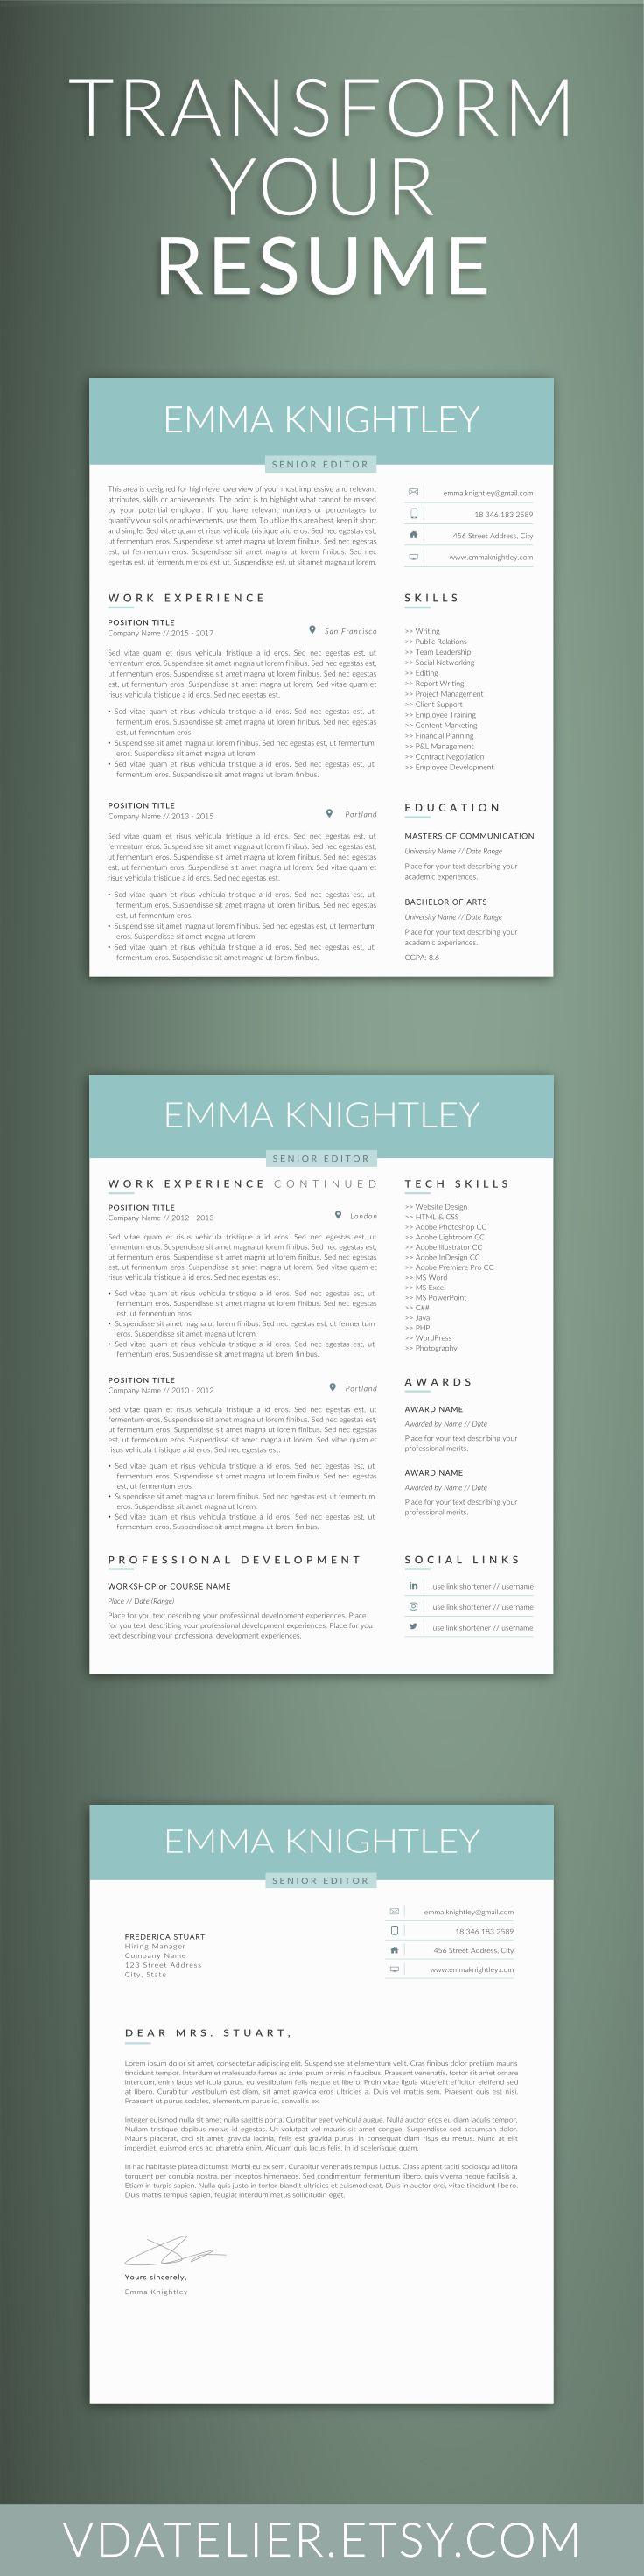 professional resume template word easy edit resume cv modern template for word feminine